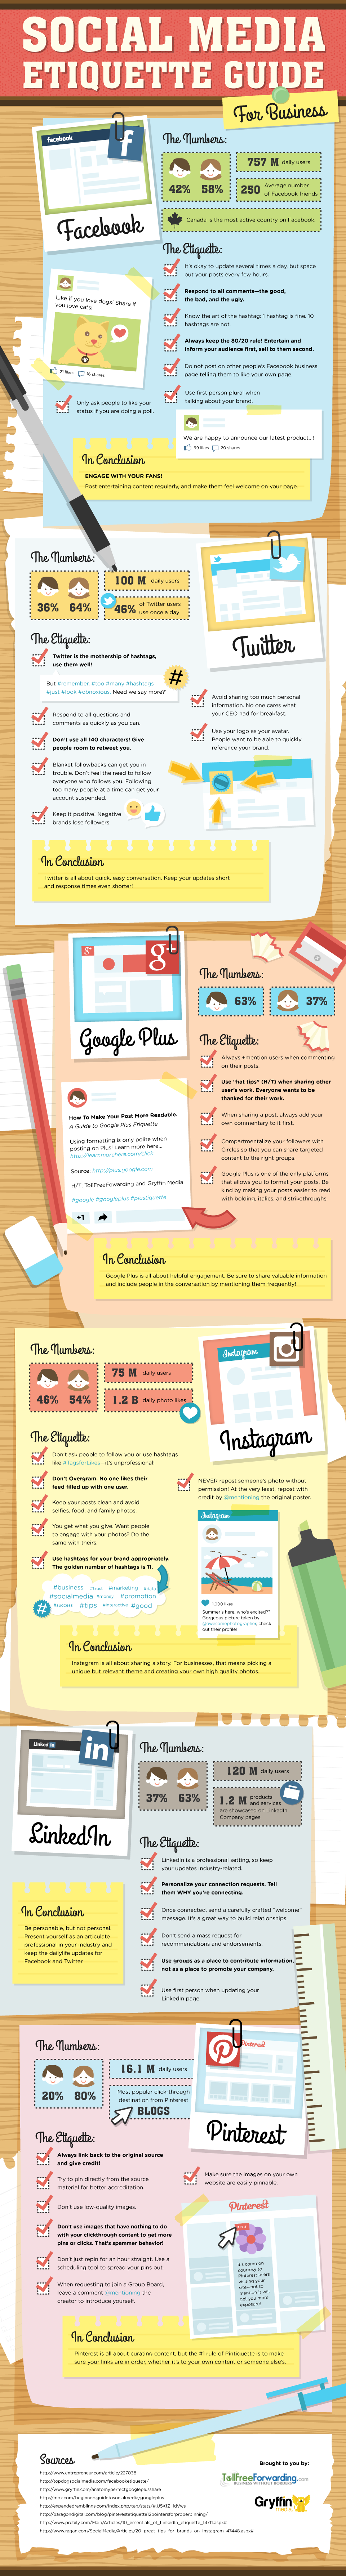 Ultimate Guide to Social Media Etiquette